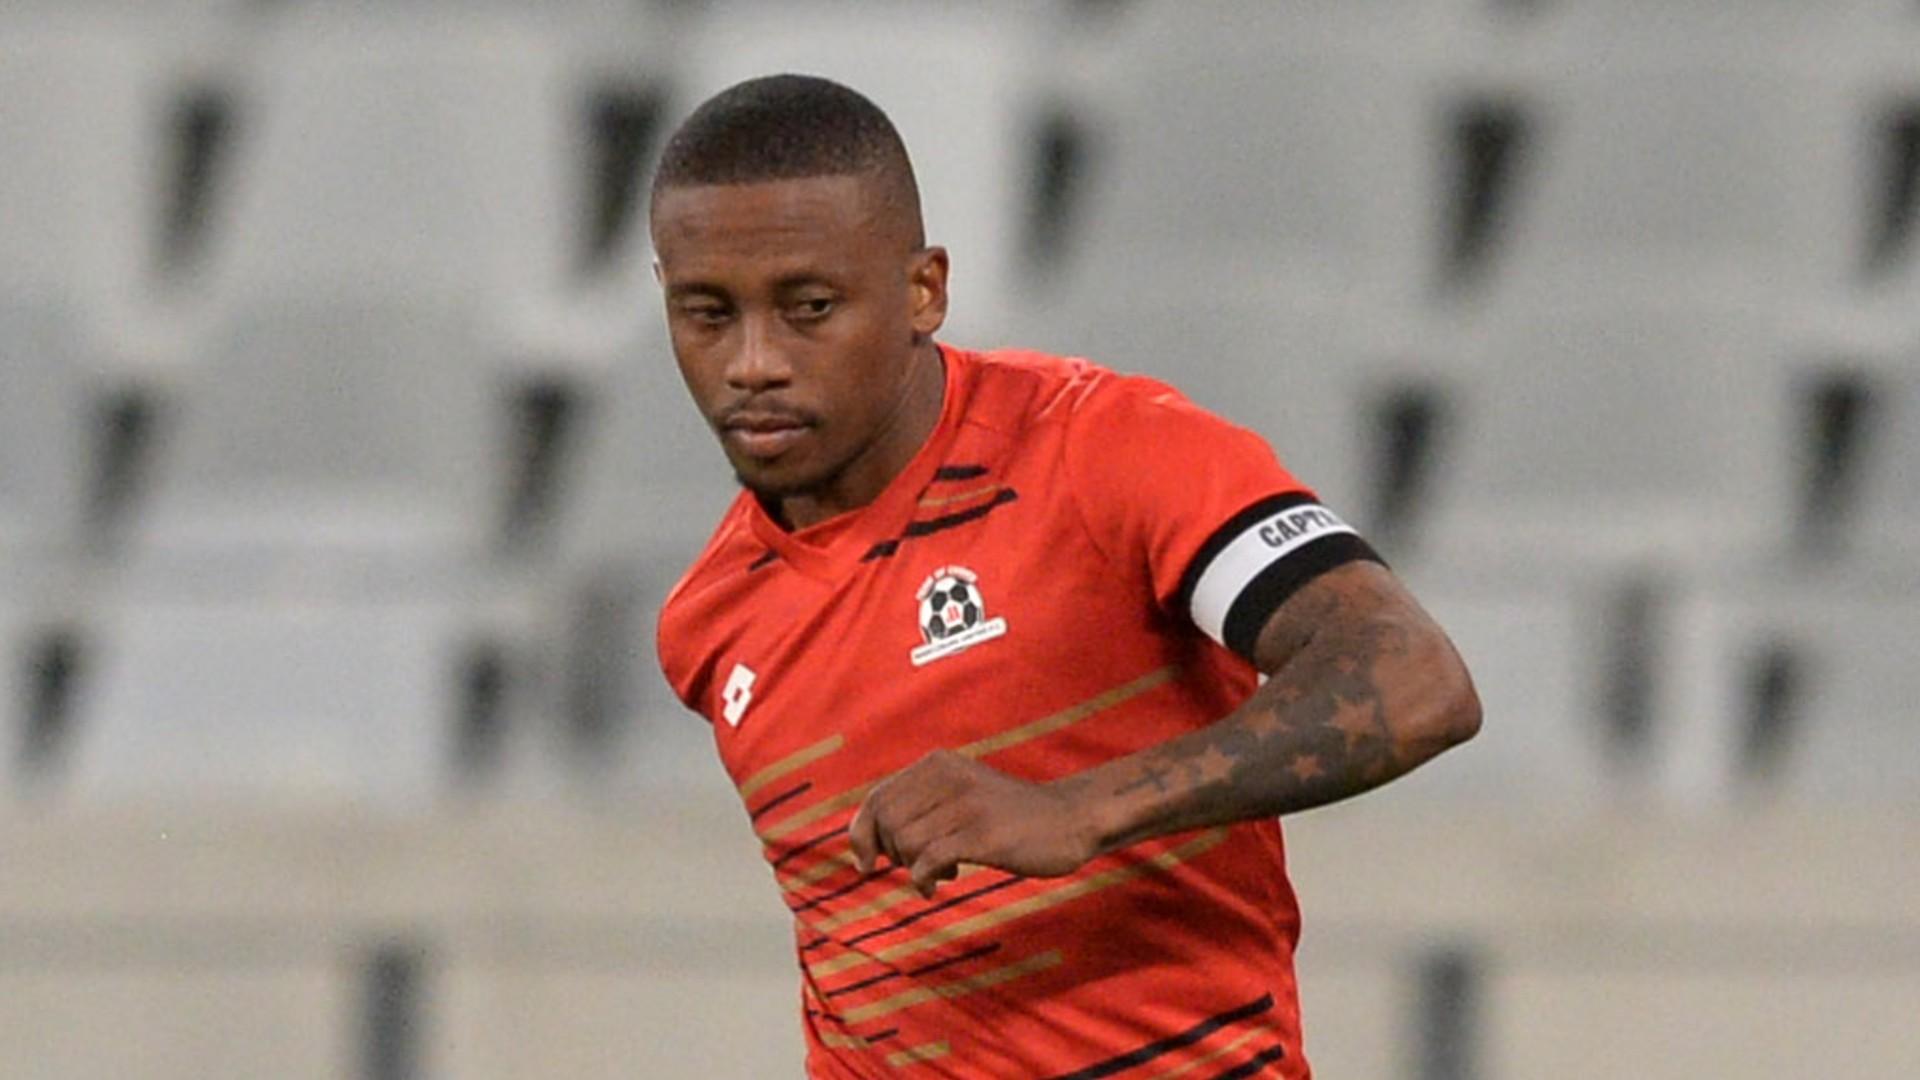 Mamelodi Sundowns 'creating a nightmare' for PSL opponents - Mokwena